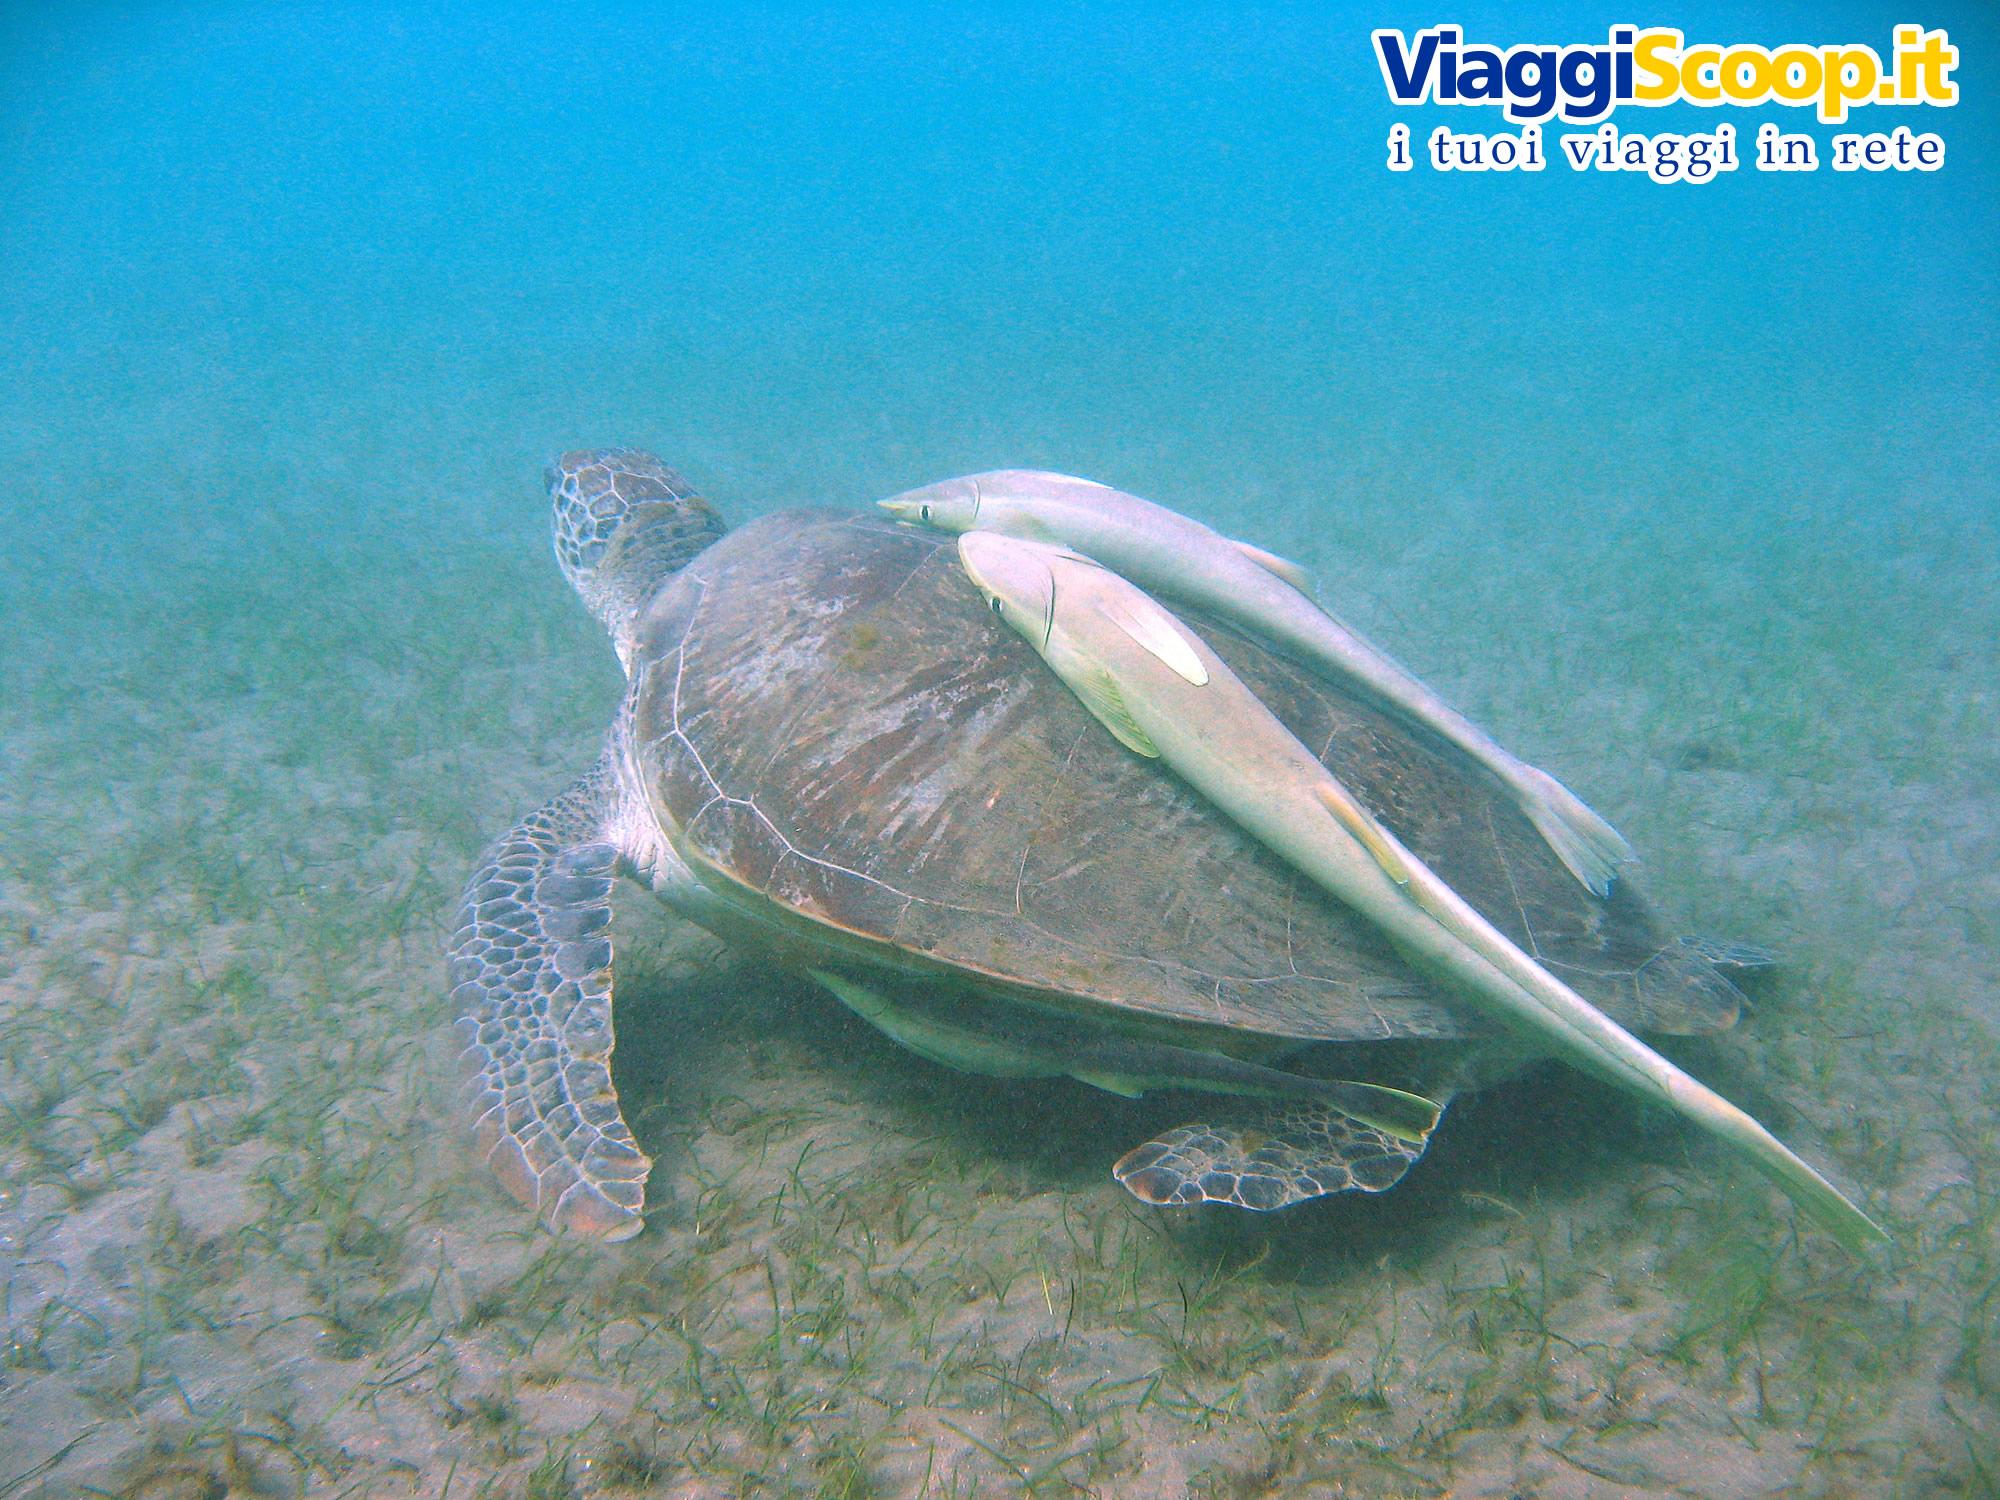 Sfondi desktop tropicali fondali marini pesci coralli foto for Sfondi pesci tropicali